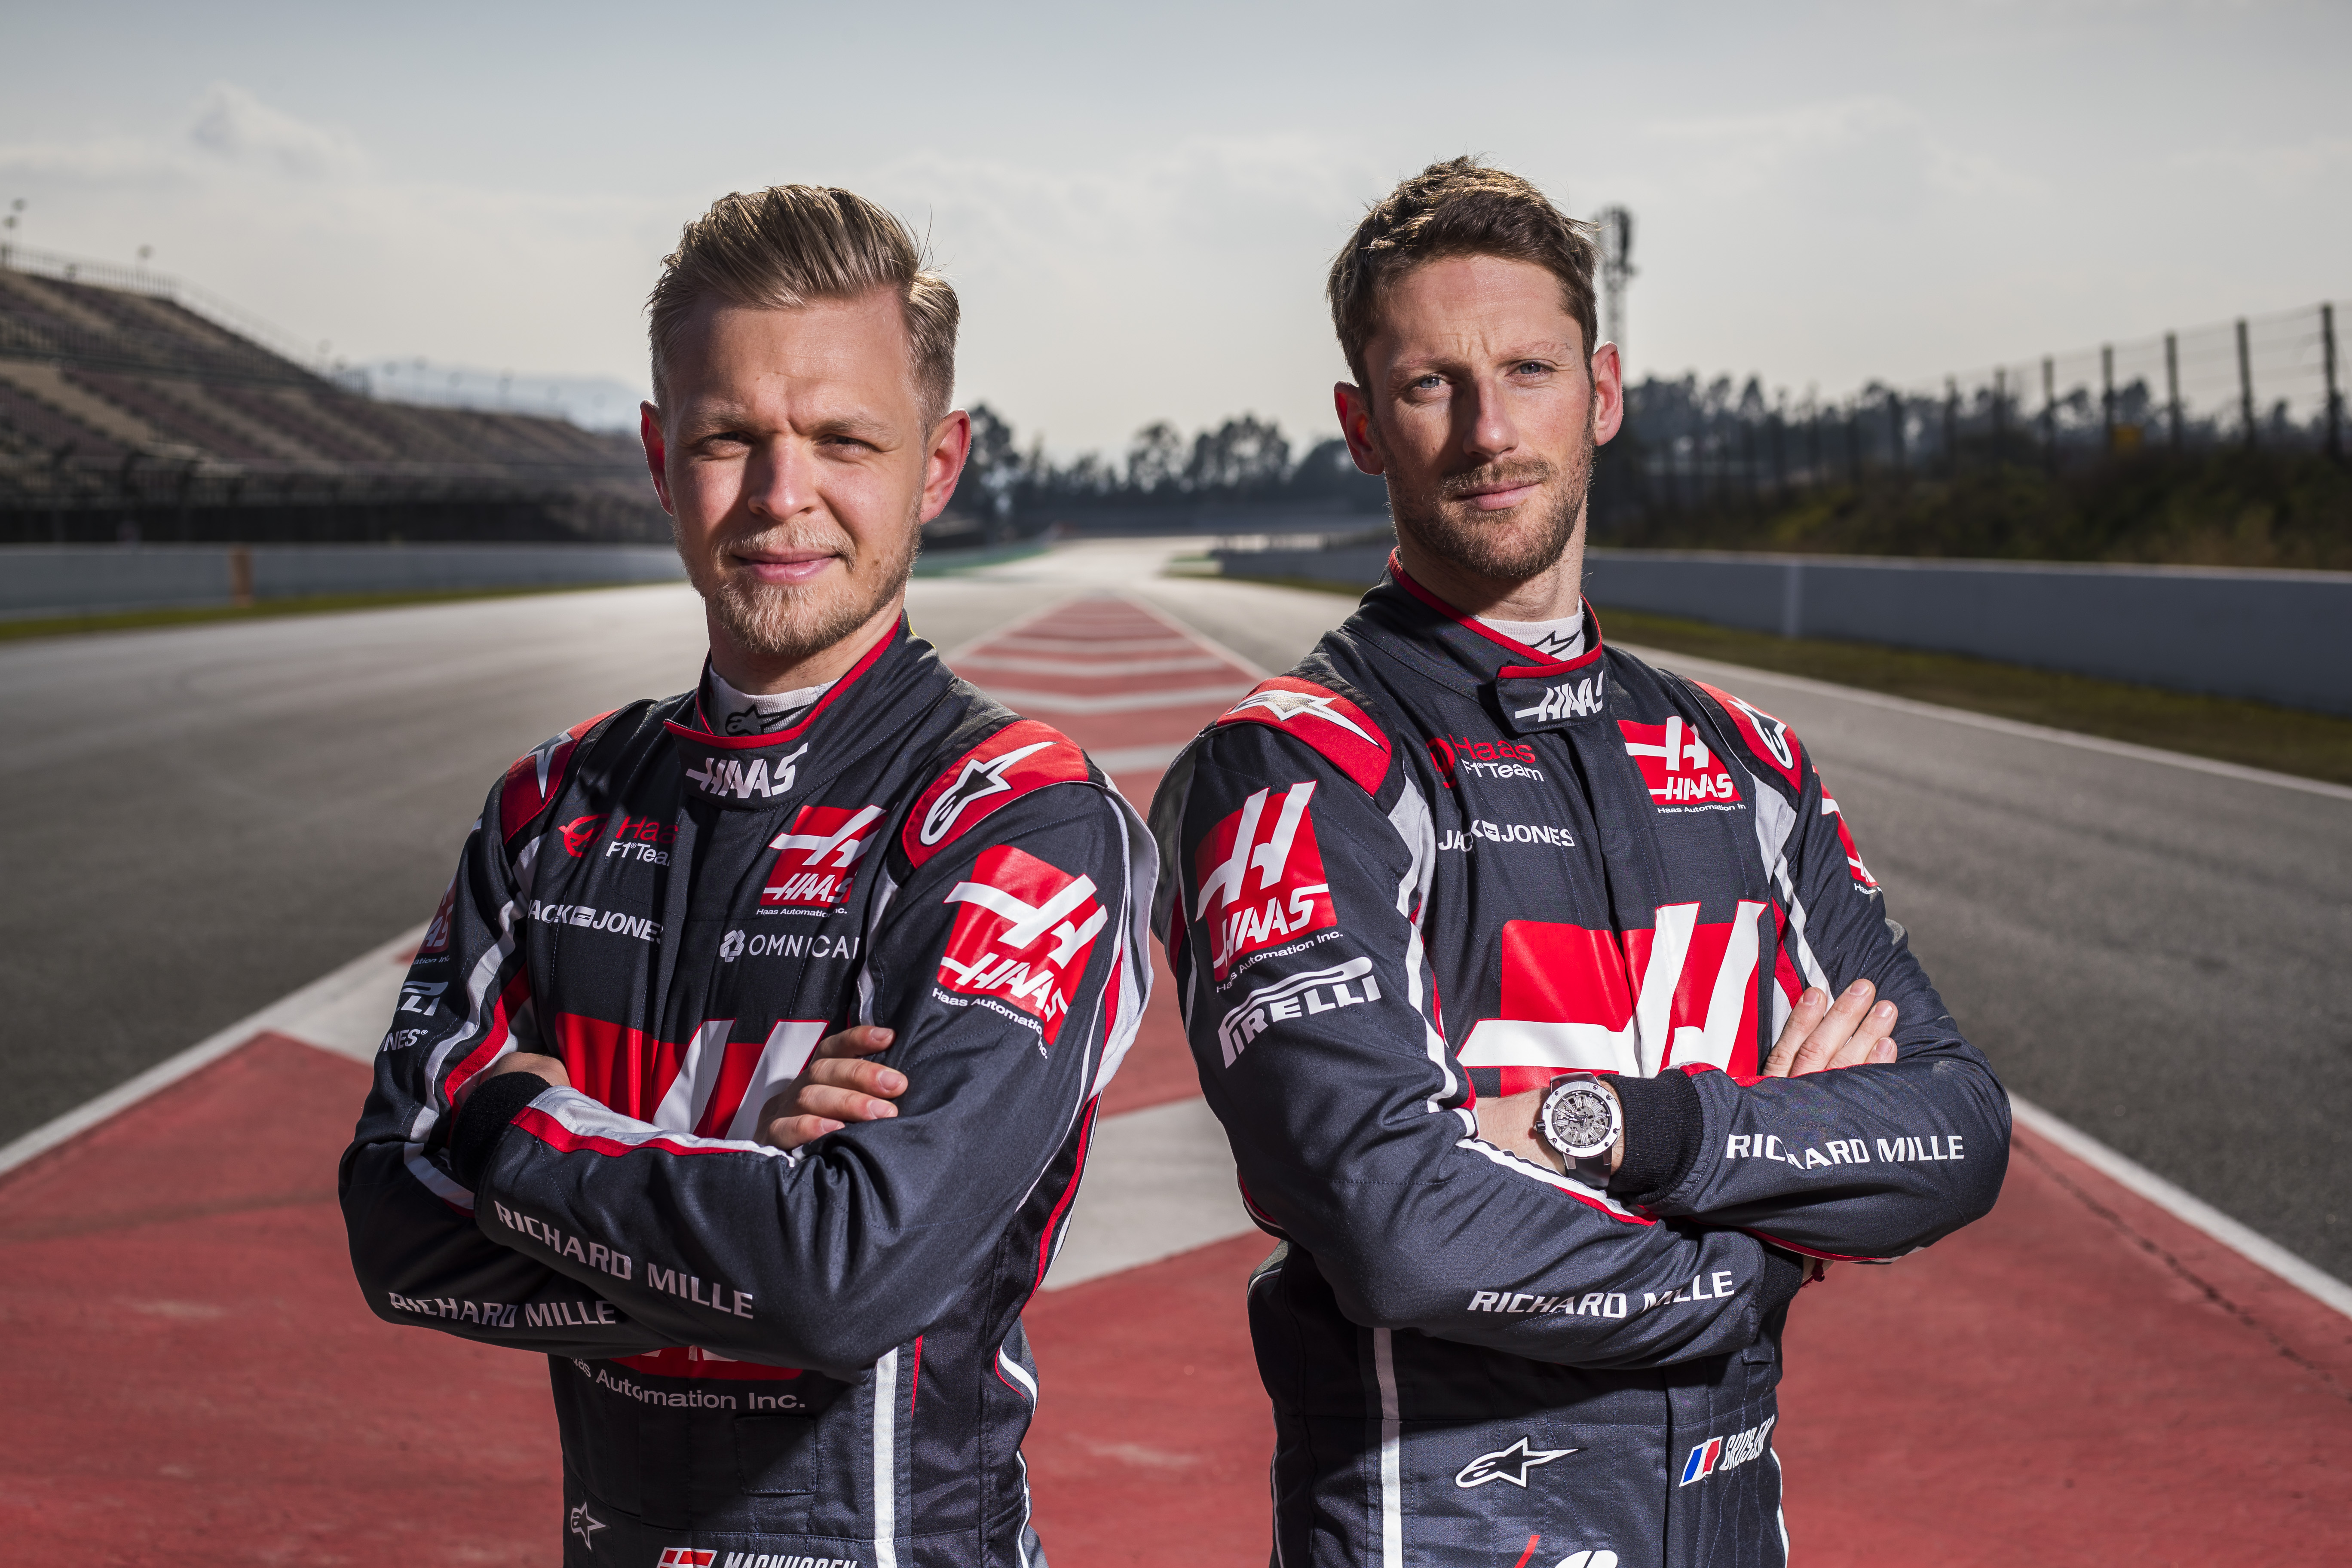 Haas Retain Magnussen And Grosjean For 2019 Formula 1